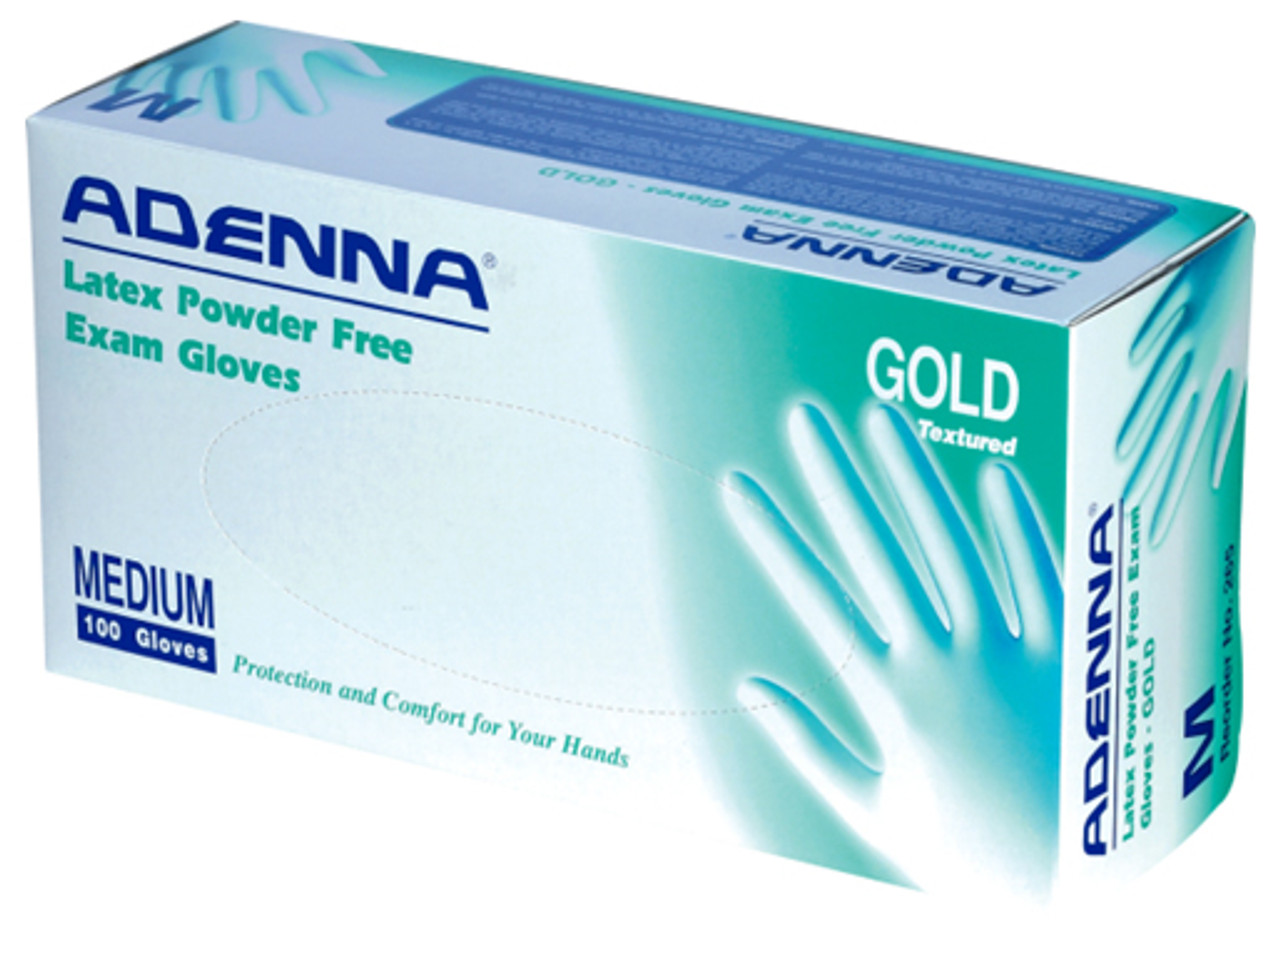 Adenna Gold Latex Powder-Free Exam Gloves 100/Box